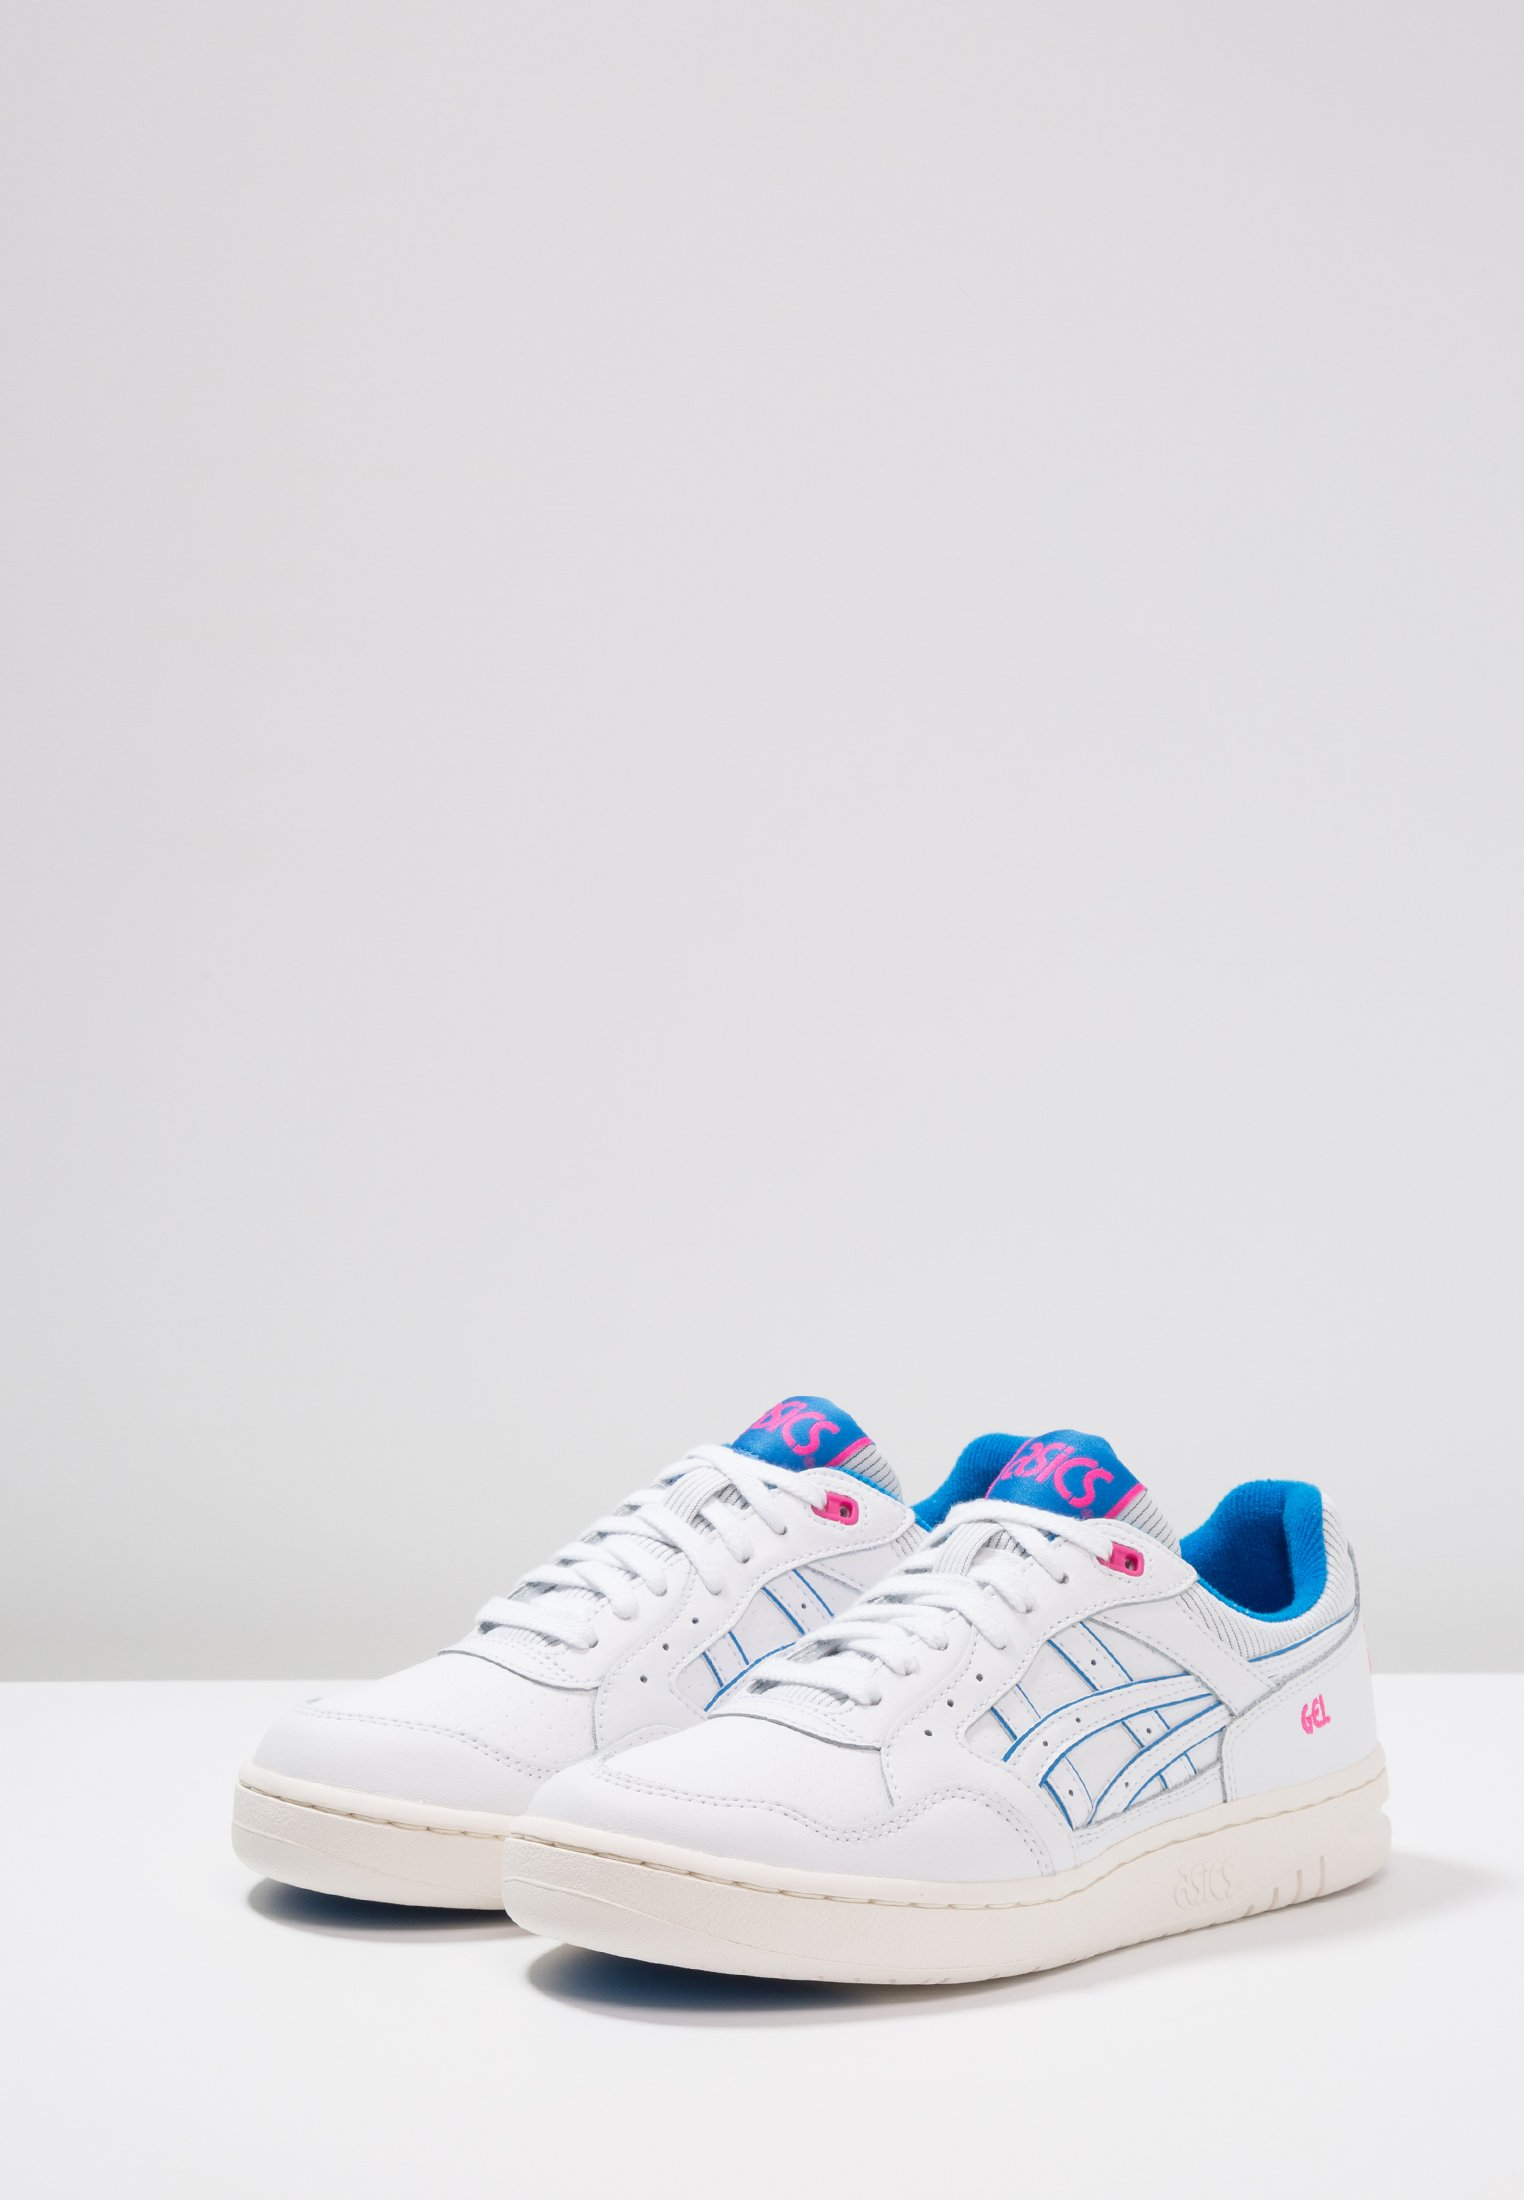 GEL CIRCUIT Sneaker low whitedirectoire blue